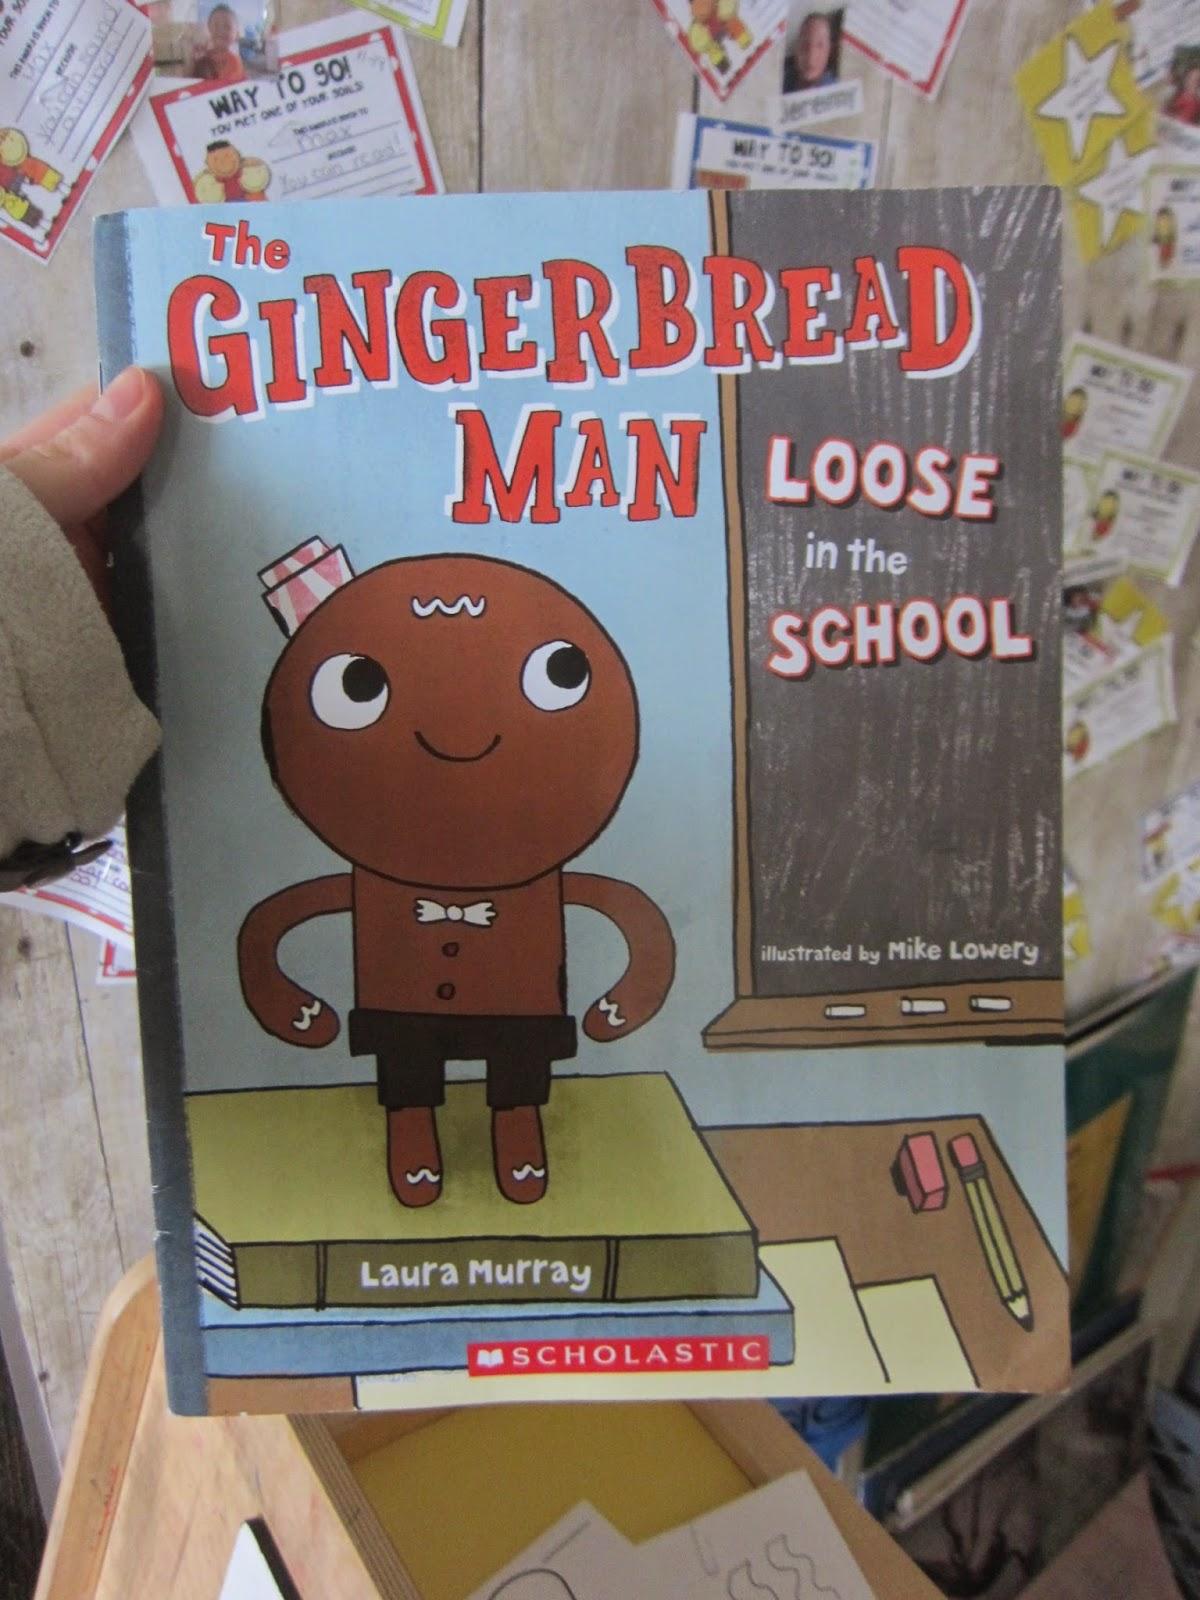 http://www.amazon.com/Gingerbread-Man-Loose-School/dp/0399250522/ref=sr_1_1?ie=UTF8&qid=1424720048&sr=8-1&keywords=gingerbread+loose+school